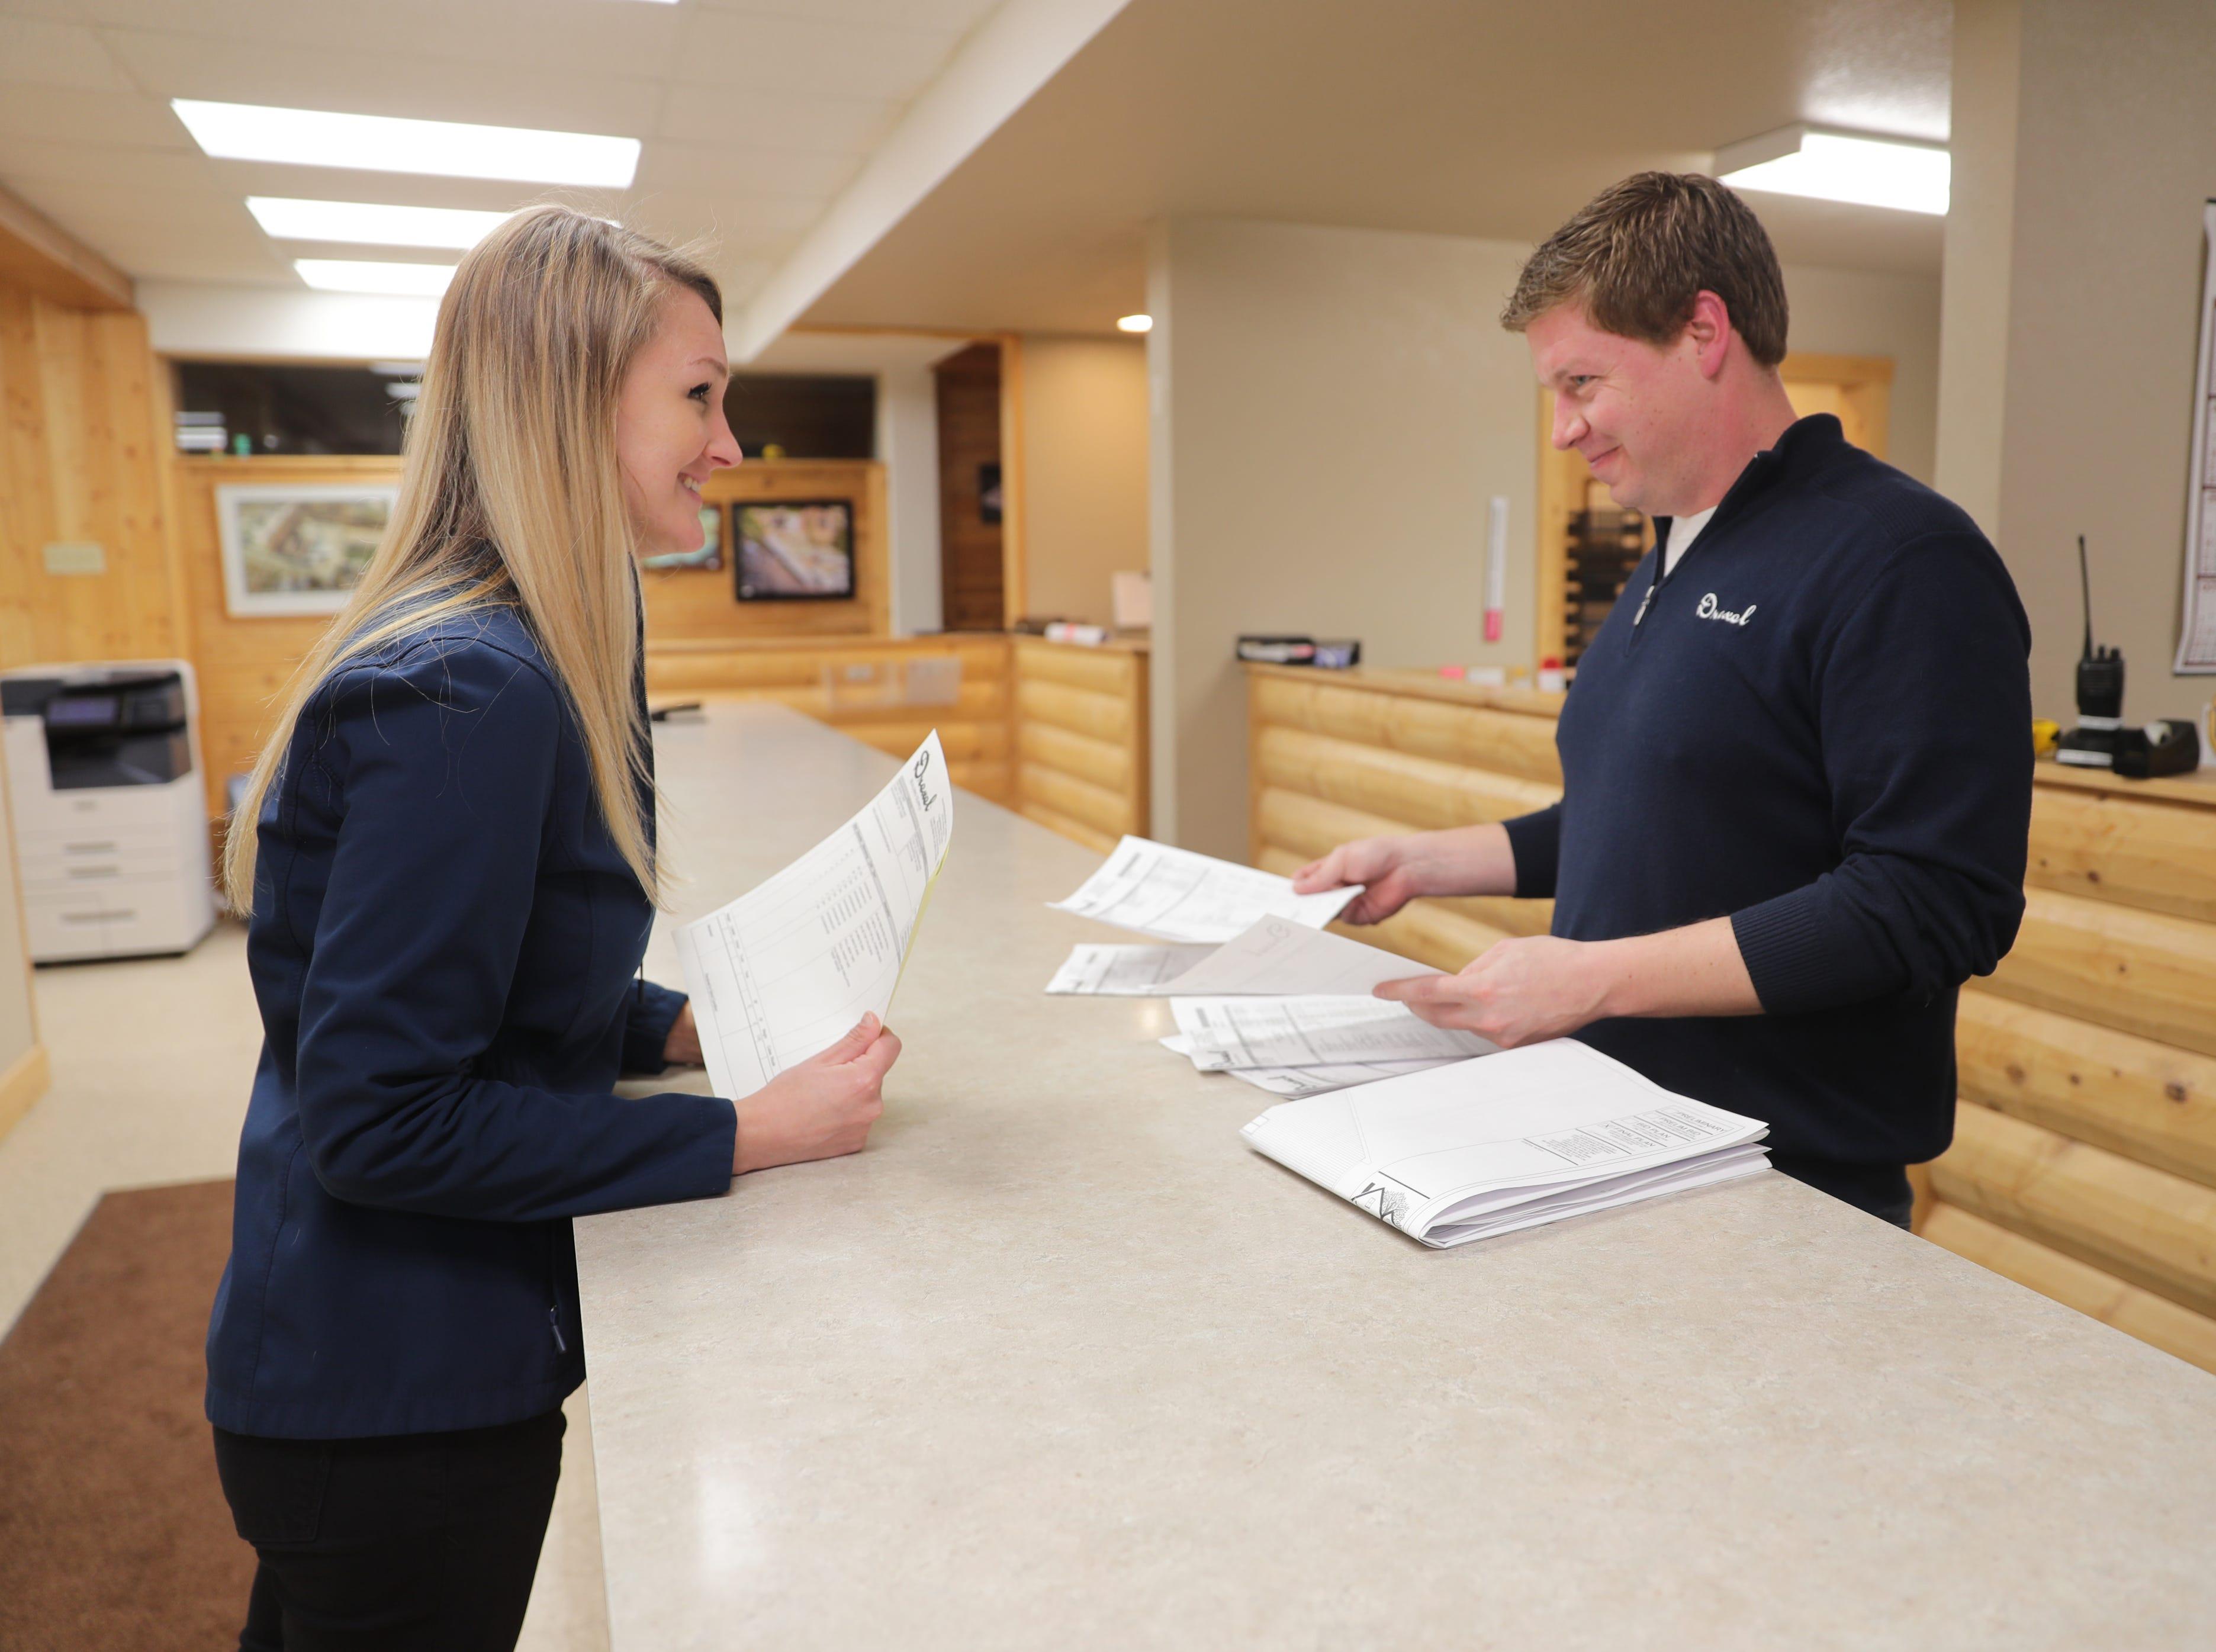 Drexel Building Supply Inc. Sales Director Julie Schmitz and Account Manager Tim Mulder go over orders March 5 at Drexel Building Supply Inc. in Campbellsport.